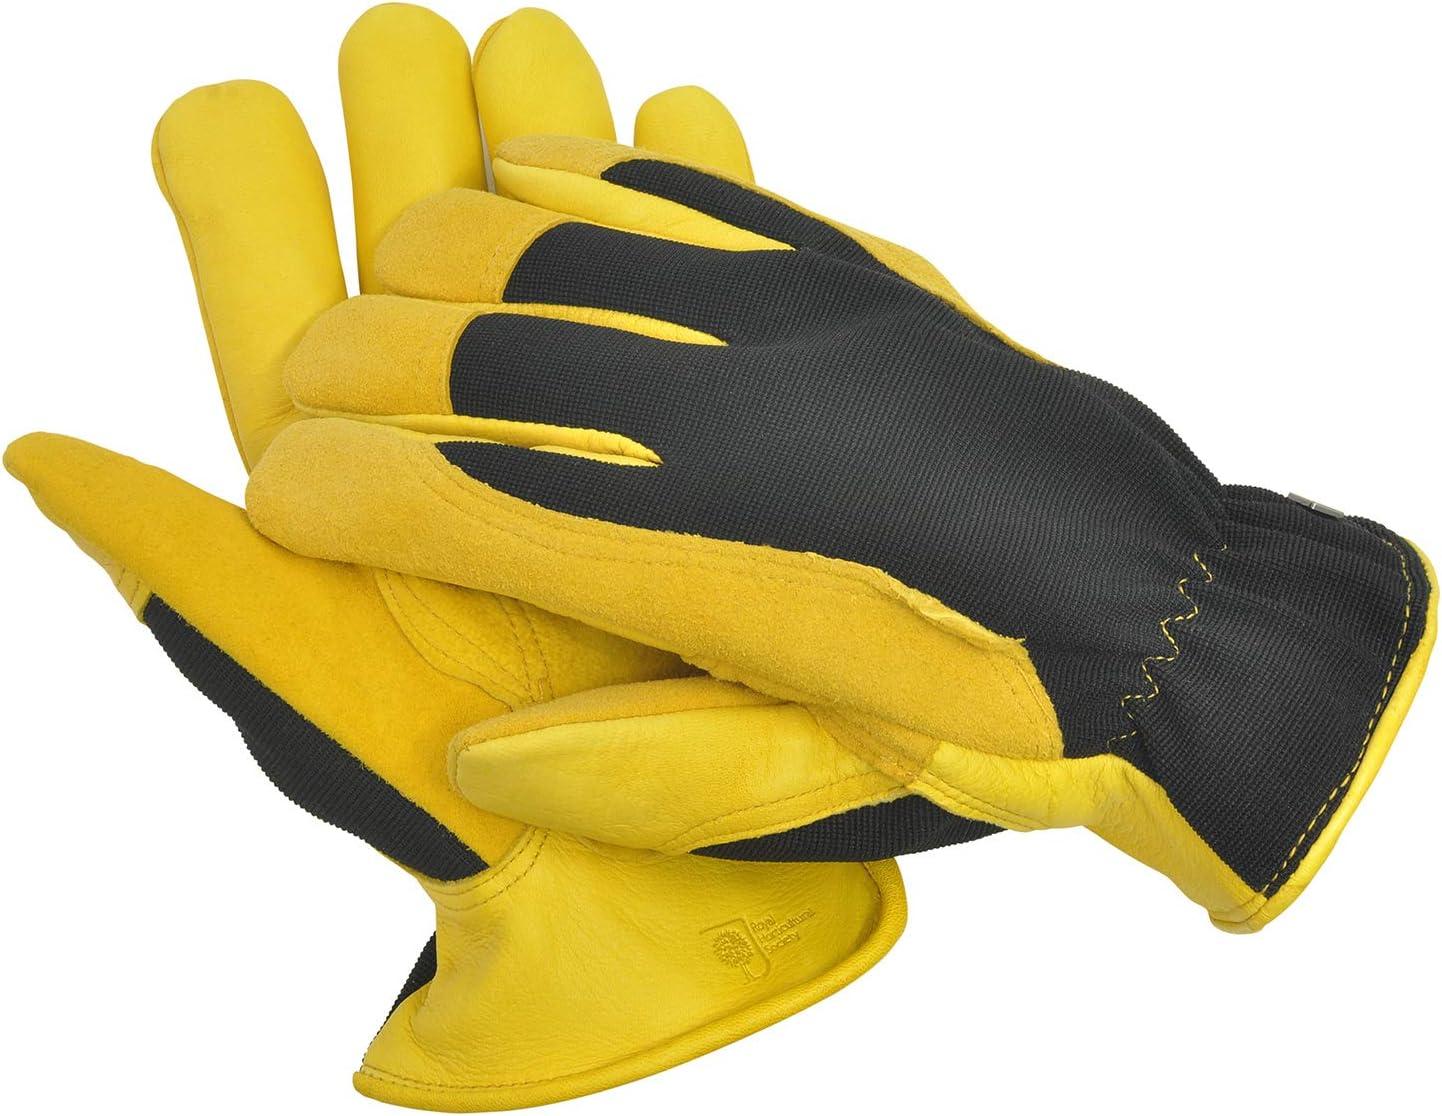 Gold Leaf Ladies Dry Touch Gardening Gloves